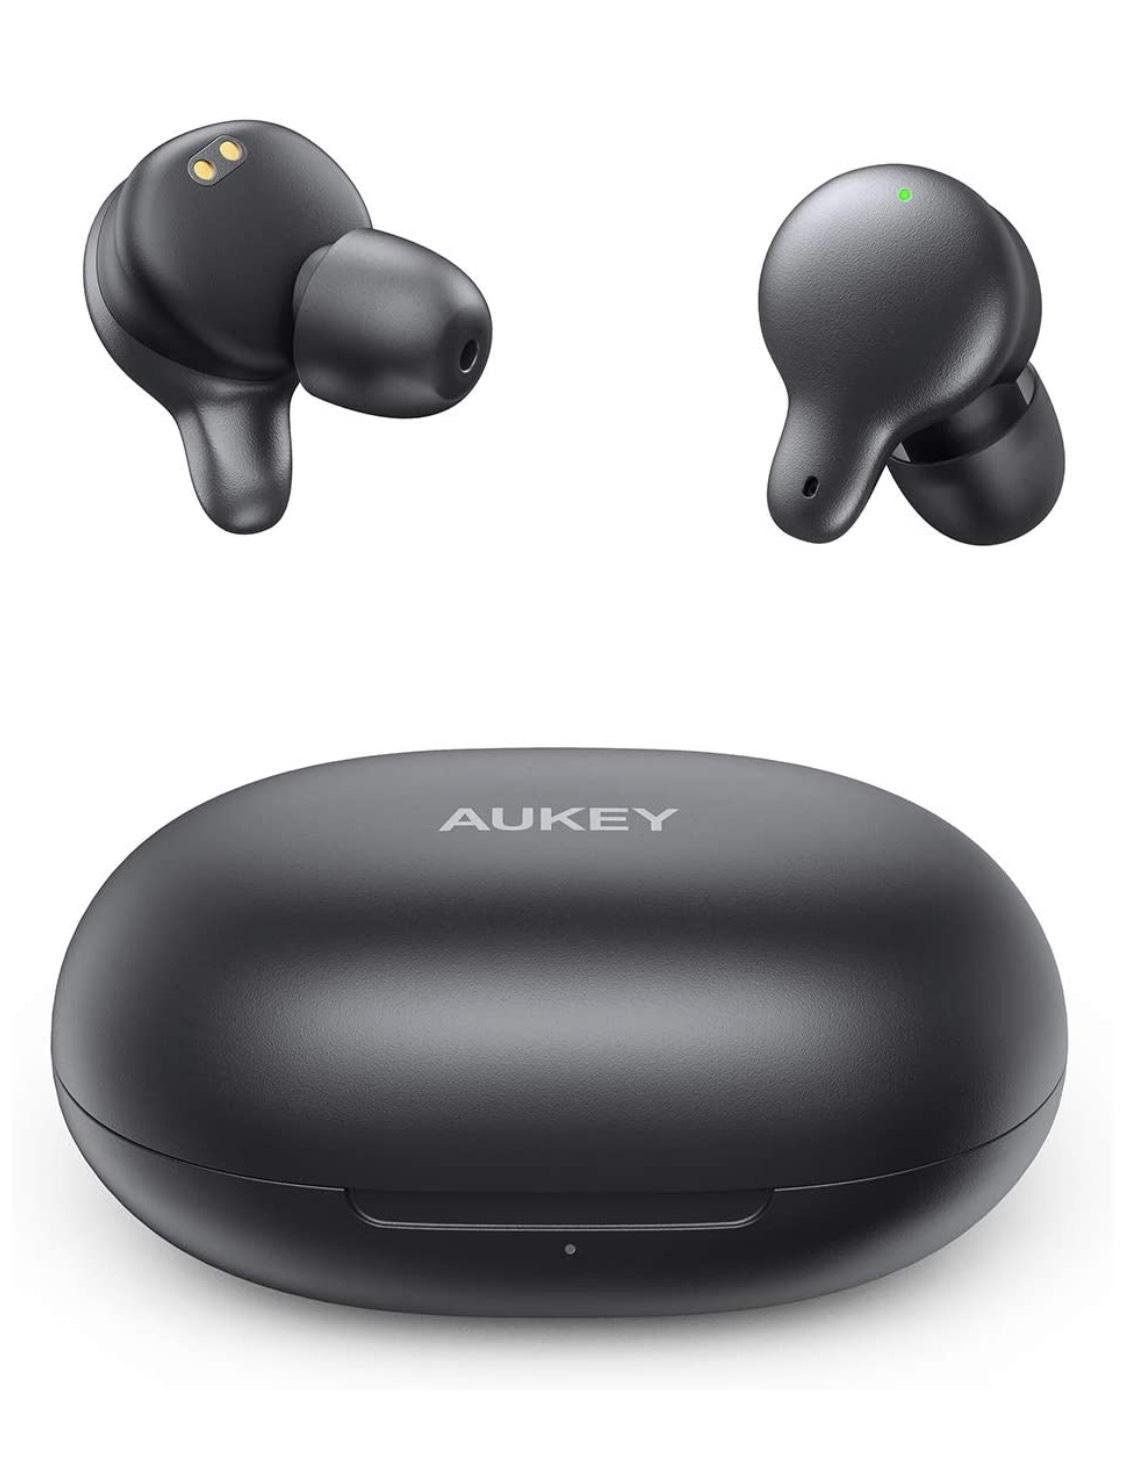 Aukey auricolari wireless